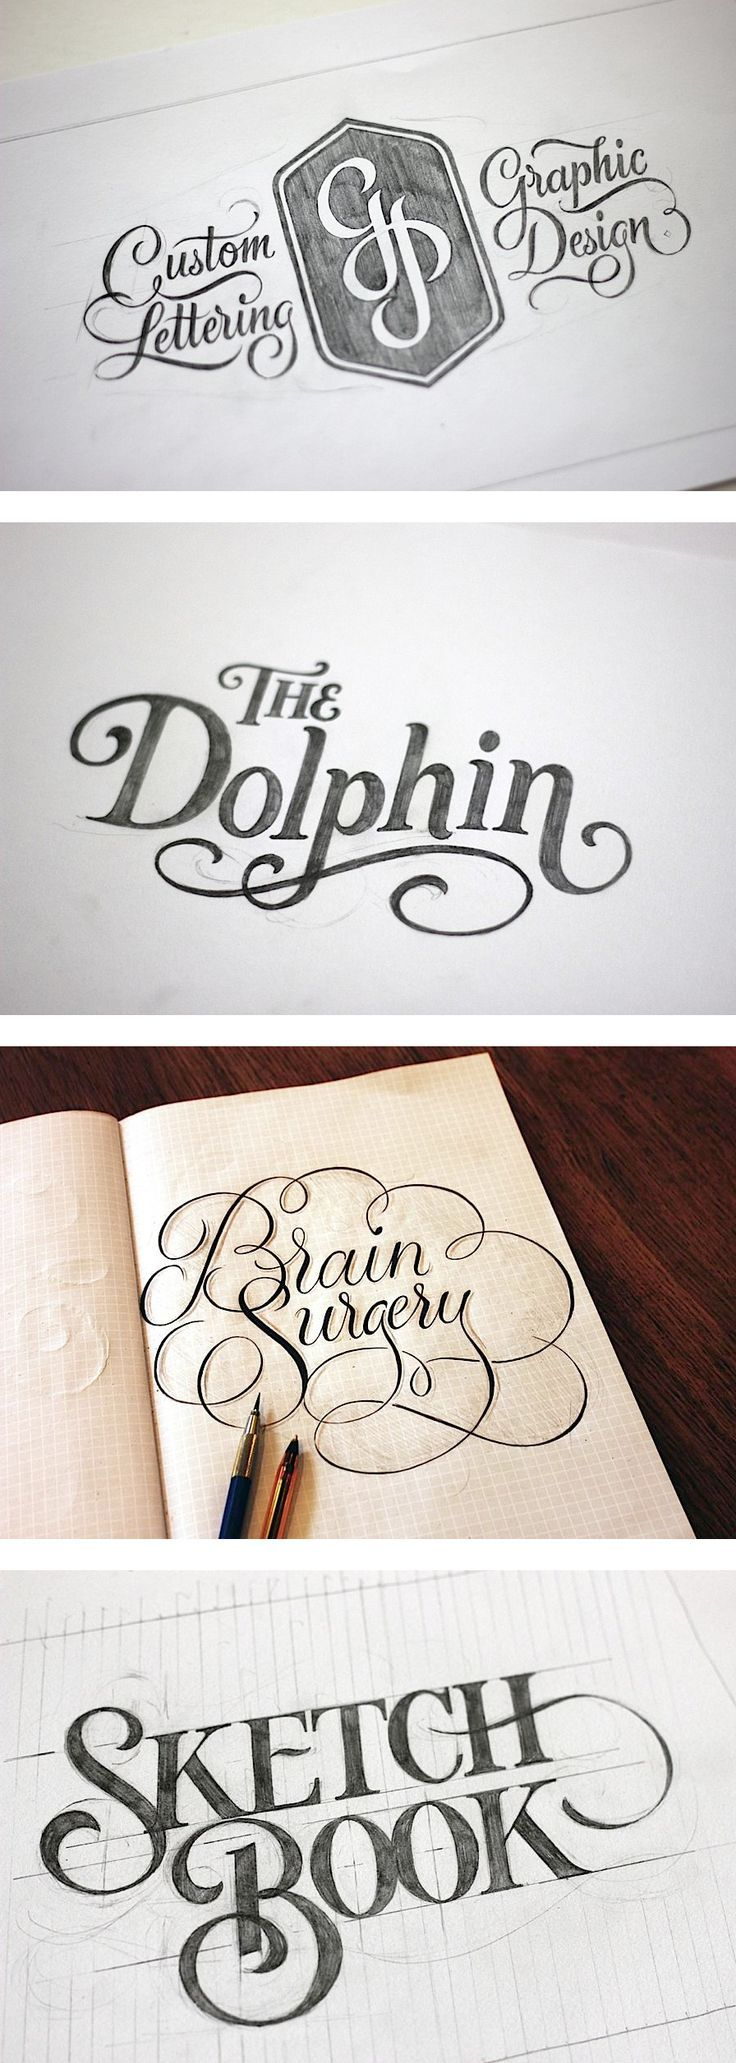 best doodle calligraphy images on Pinterest Doodles Botanical